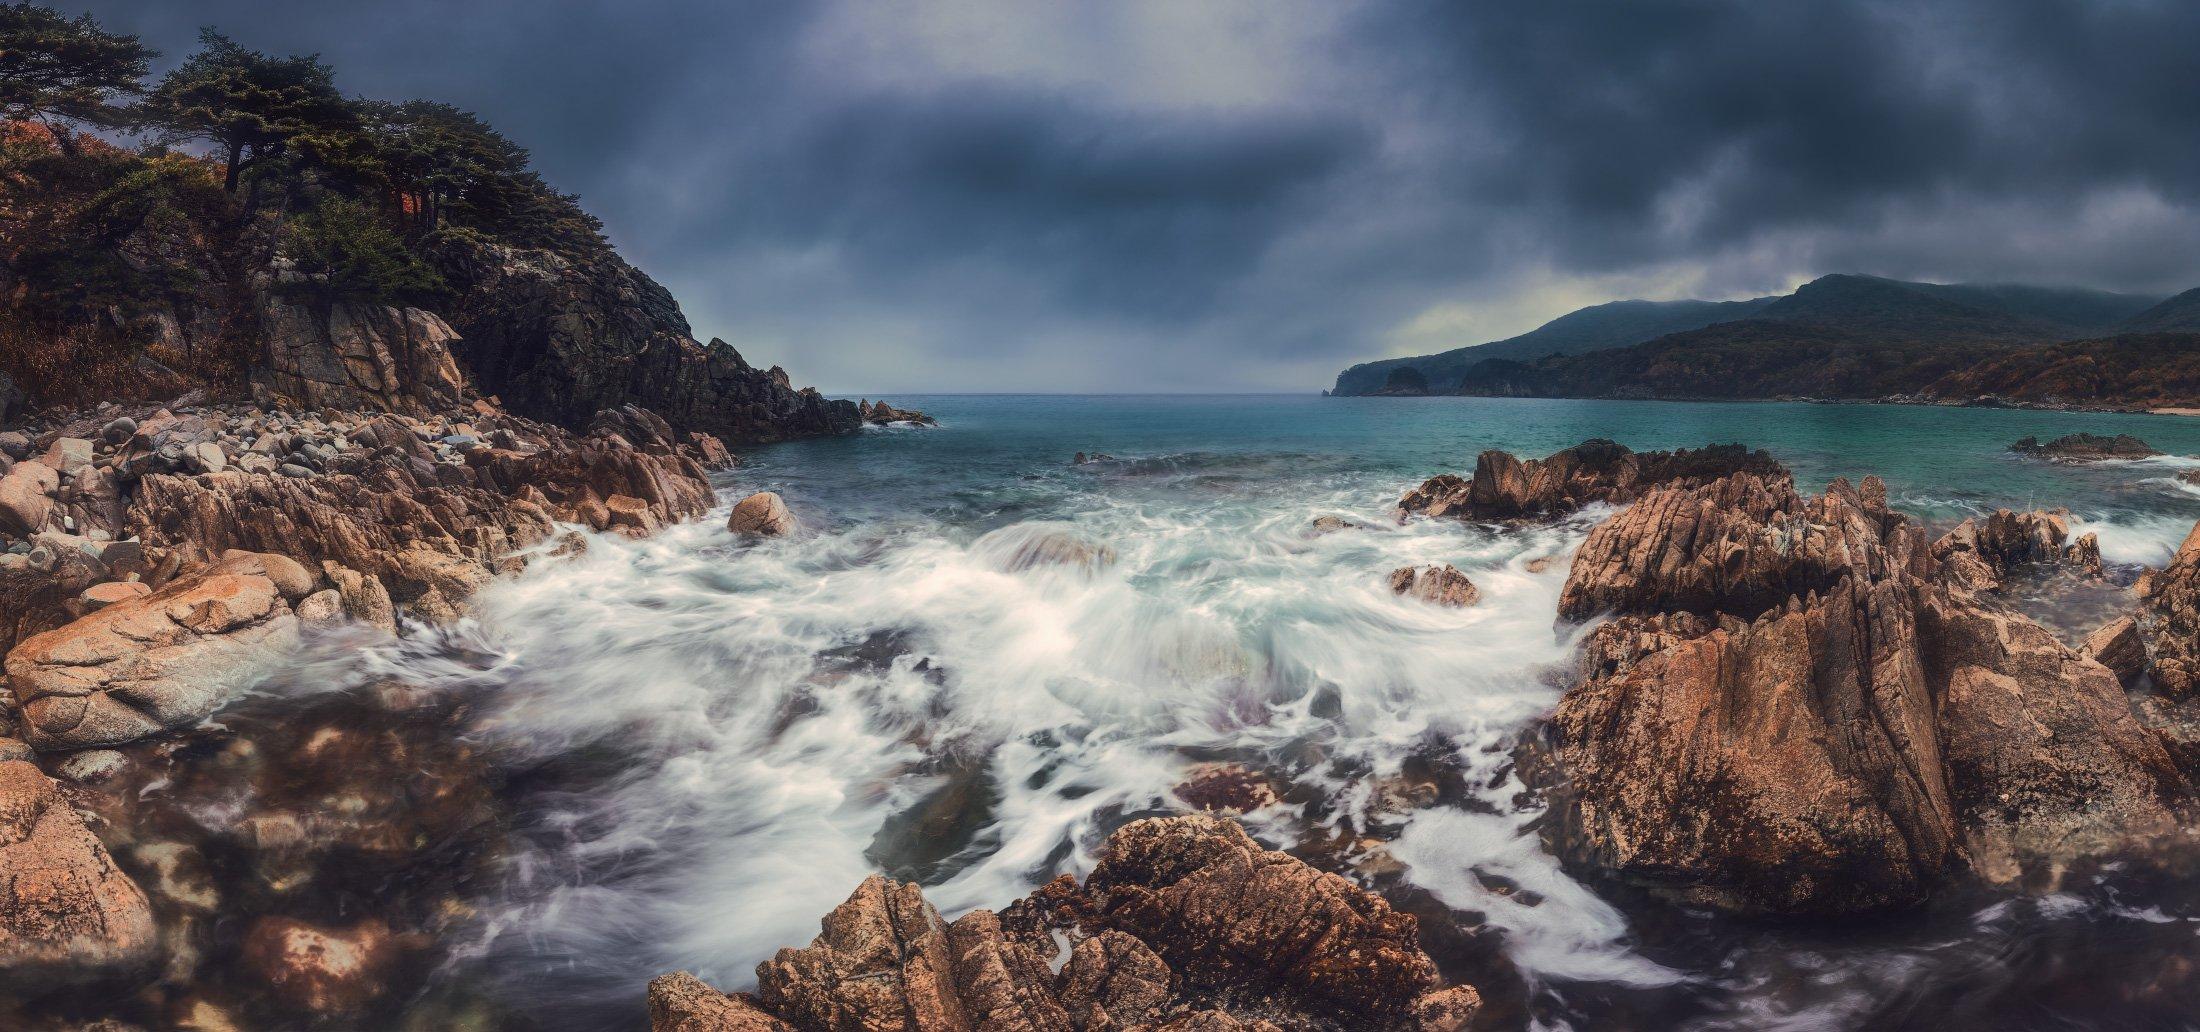 панорама, море, осень, скалы, Андрей Кровлин